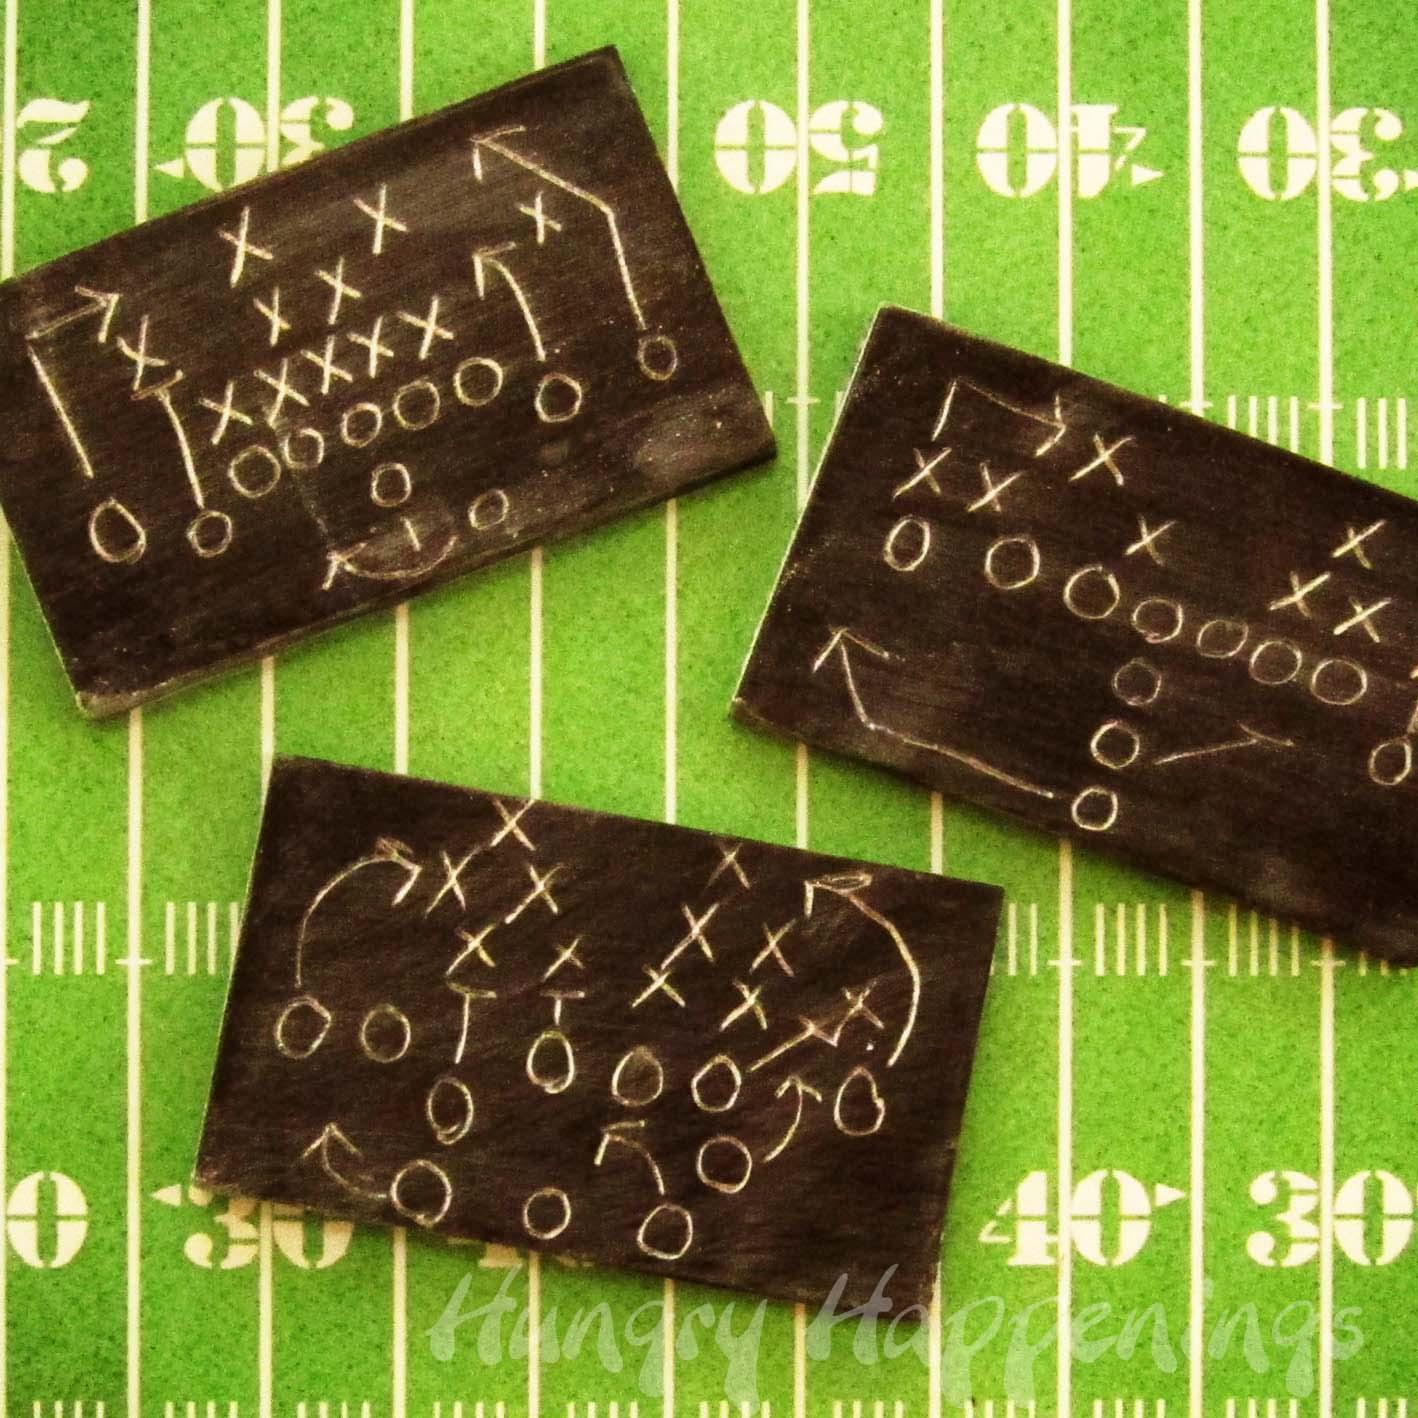 Super Bowl Edible Chalkboards C Party Favors C Chocolate C Diagram C Football Plays Diagram on Football Plays Diagrams